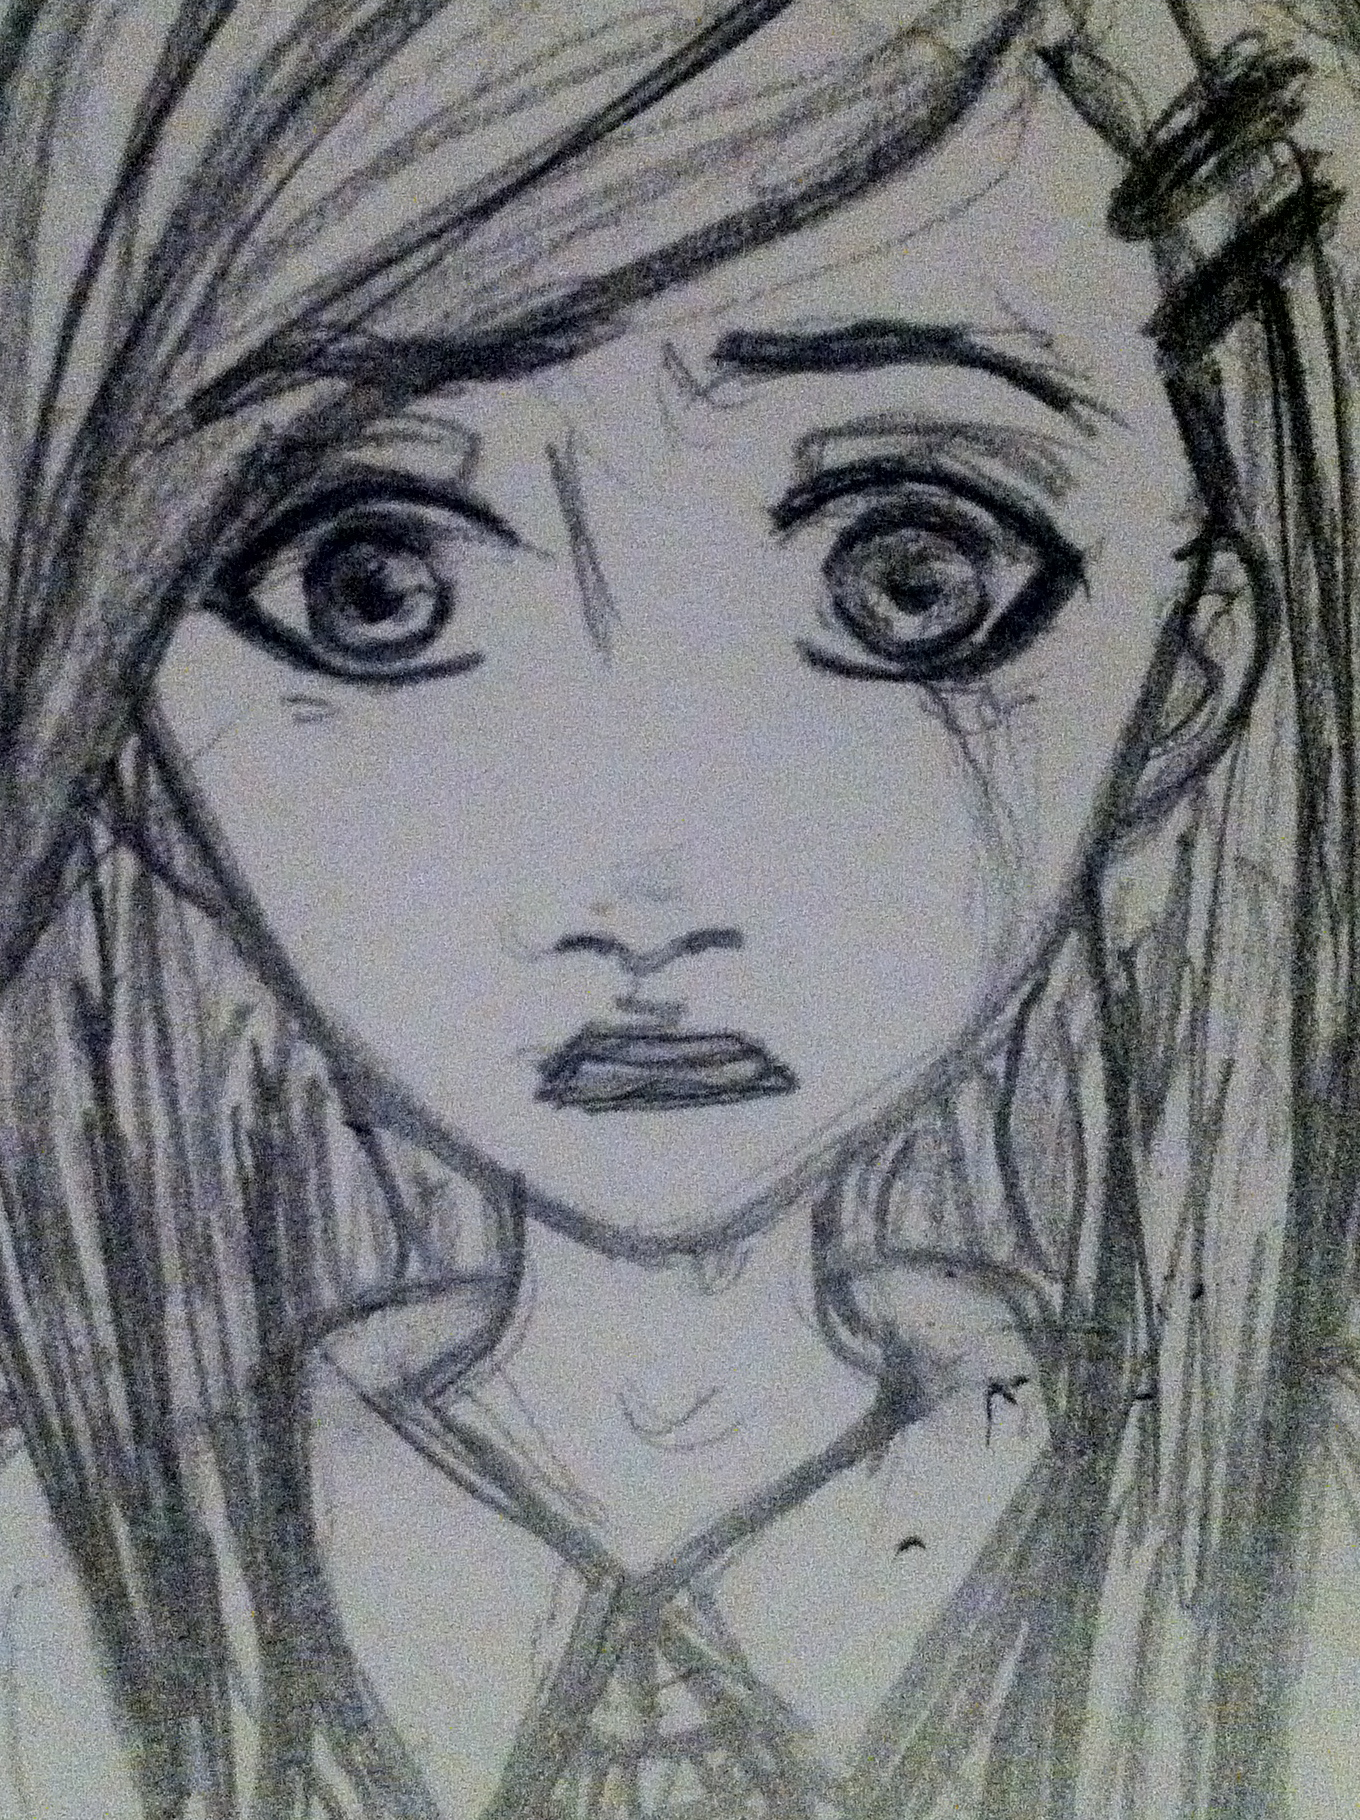 Sad Little Girl Crying Drawing